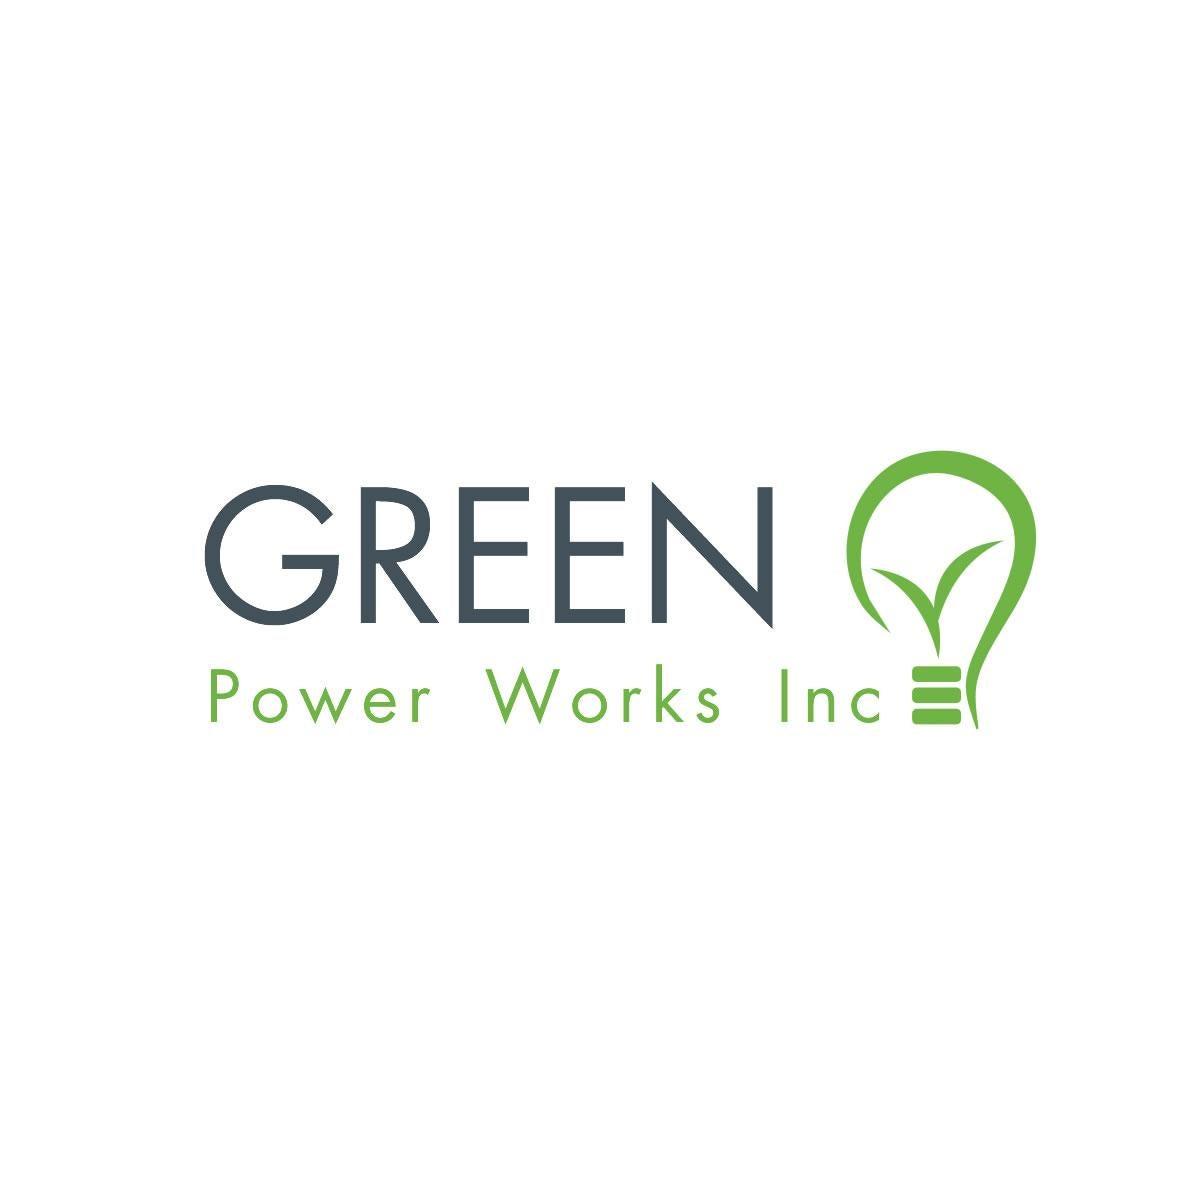 Green Power Works Inc. logo